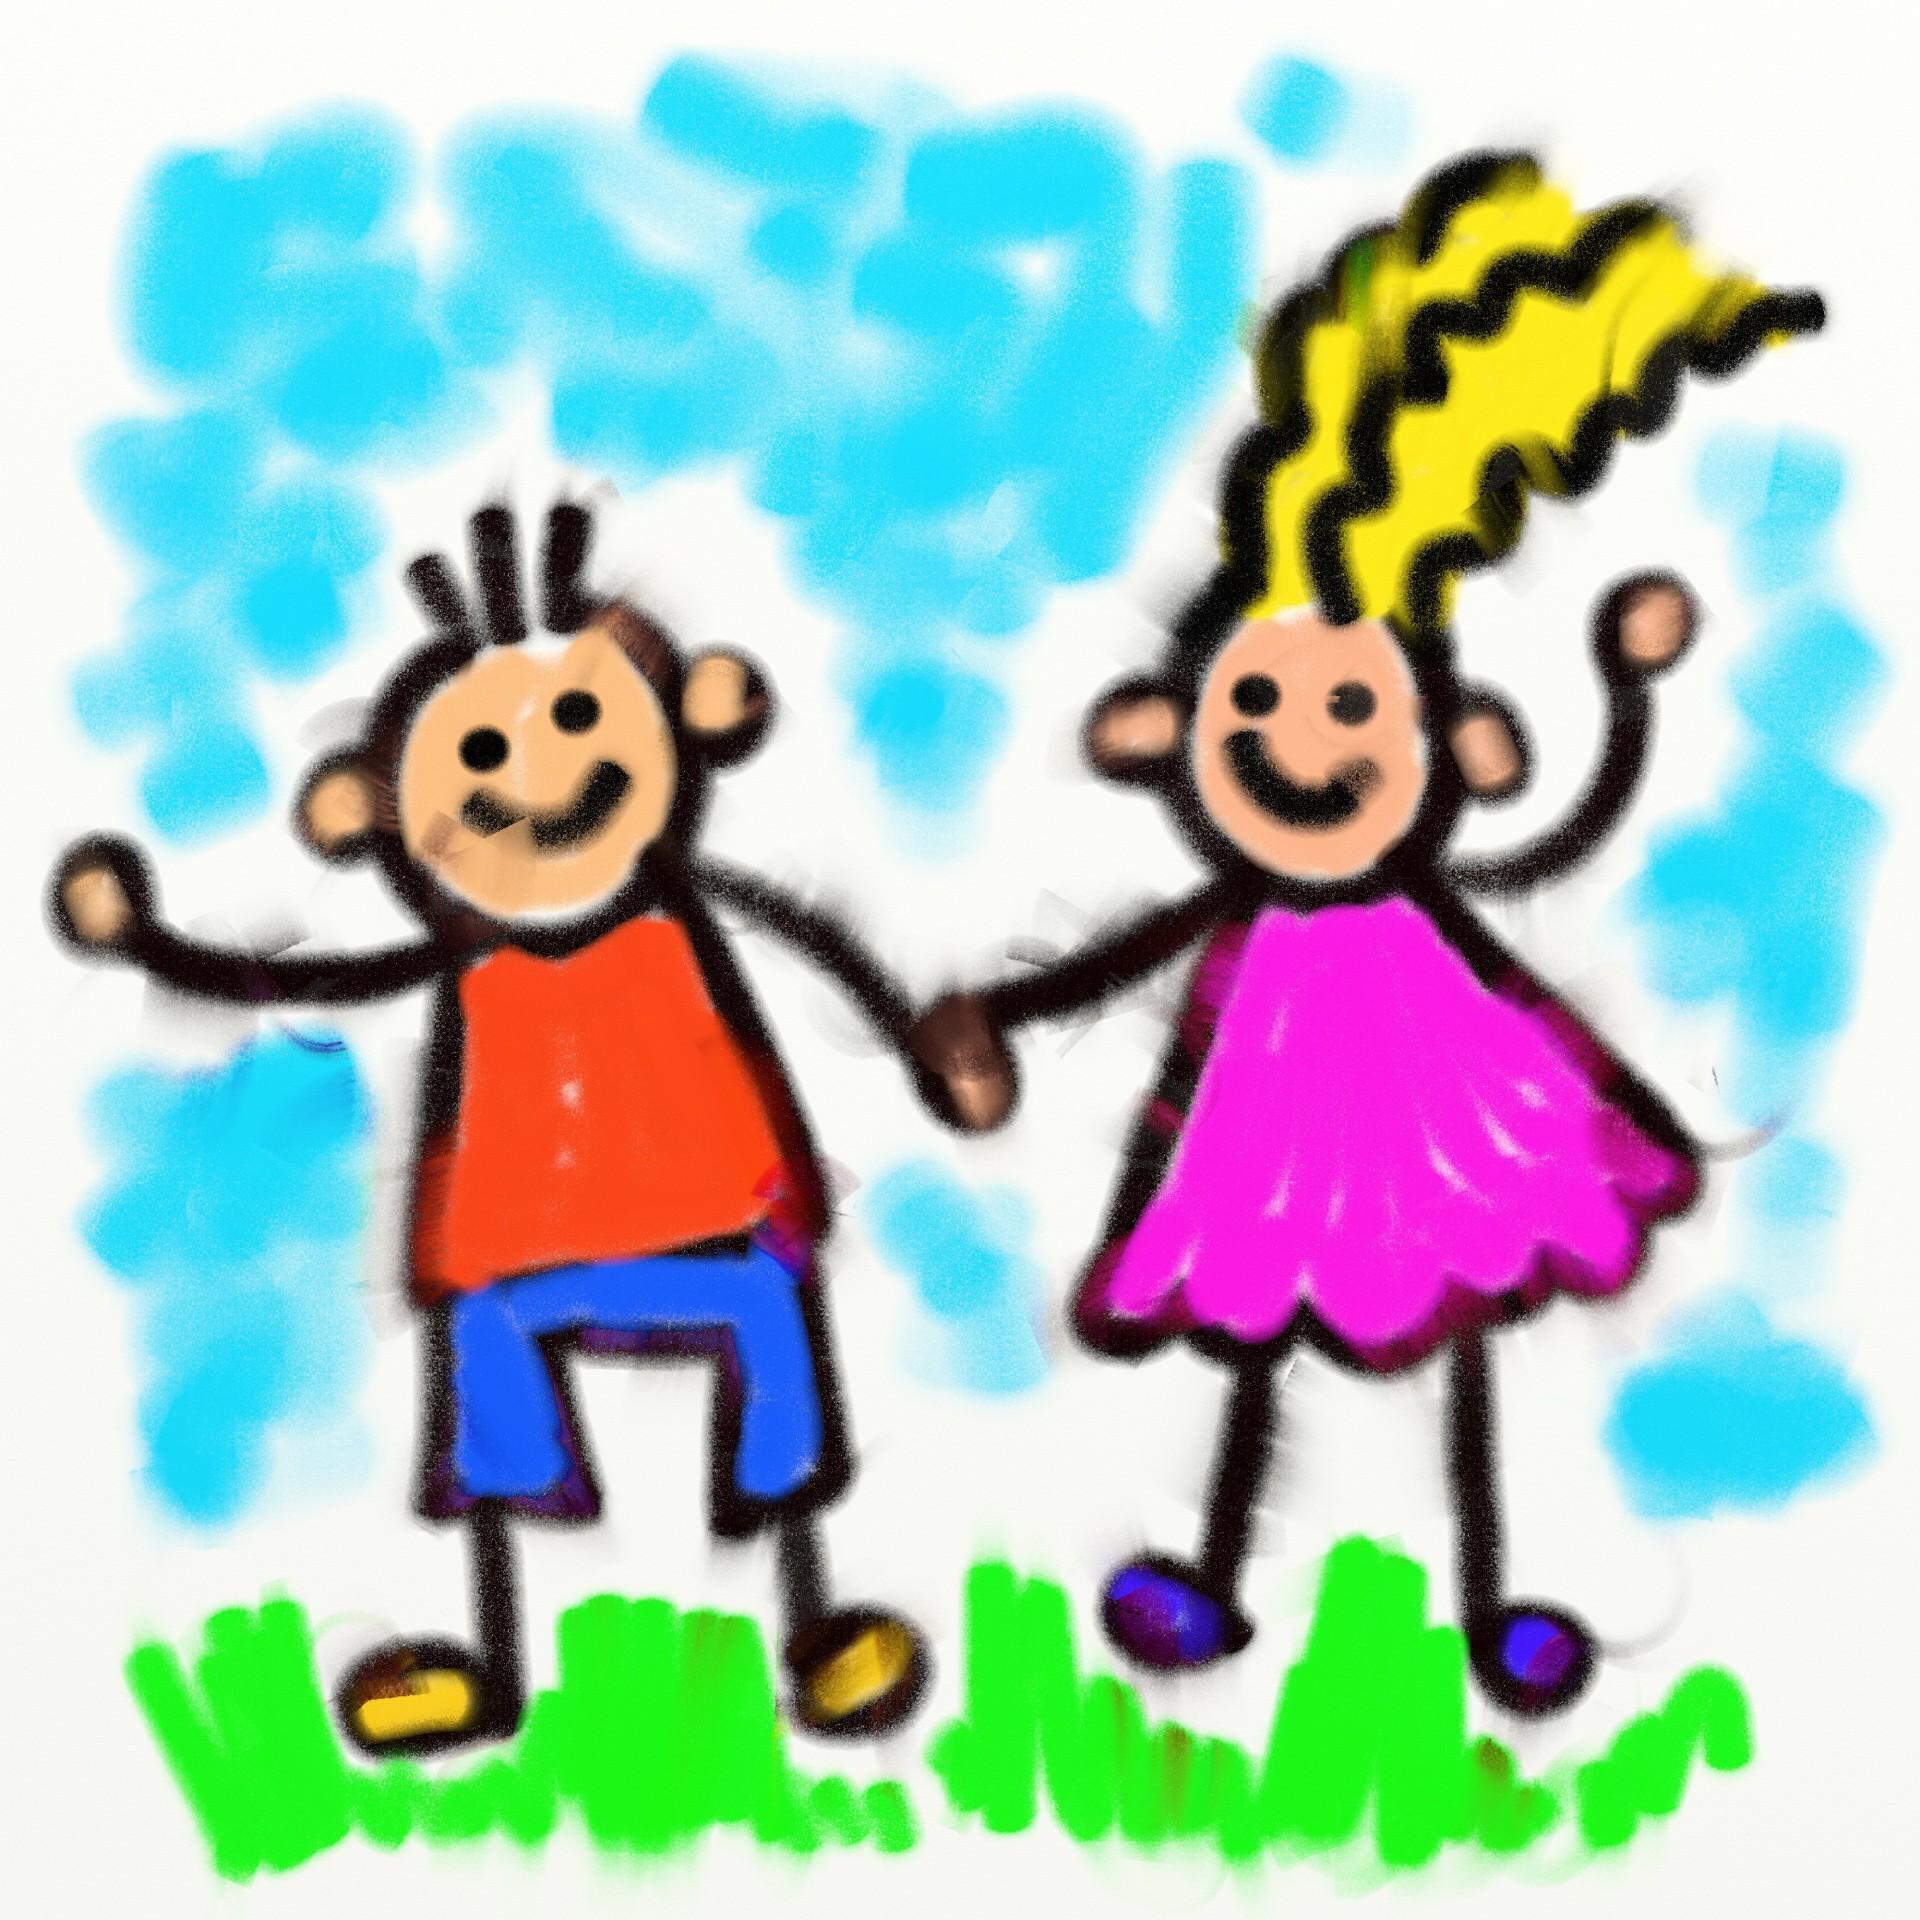 Smudge kids free stock. Chalk clipart cartoon